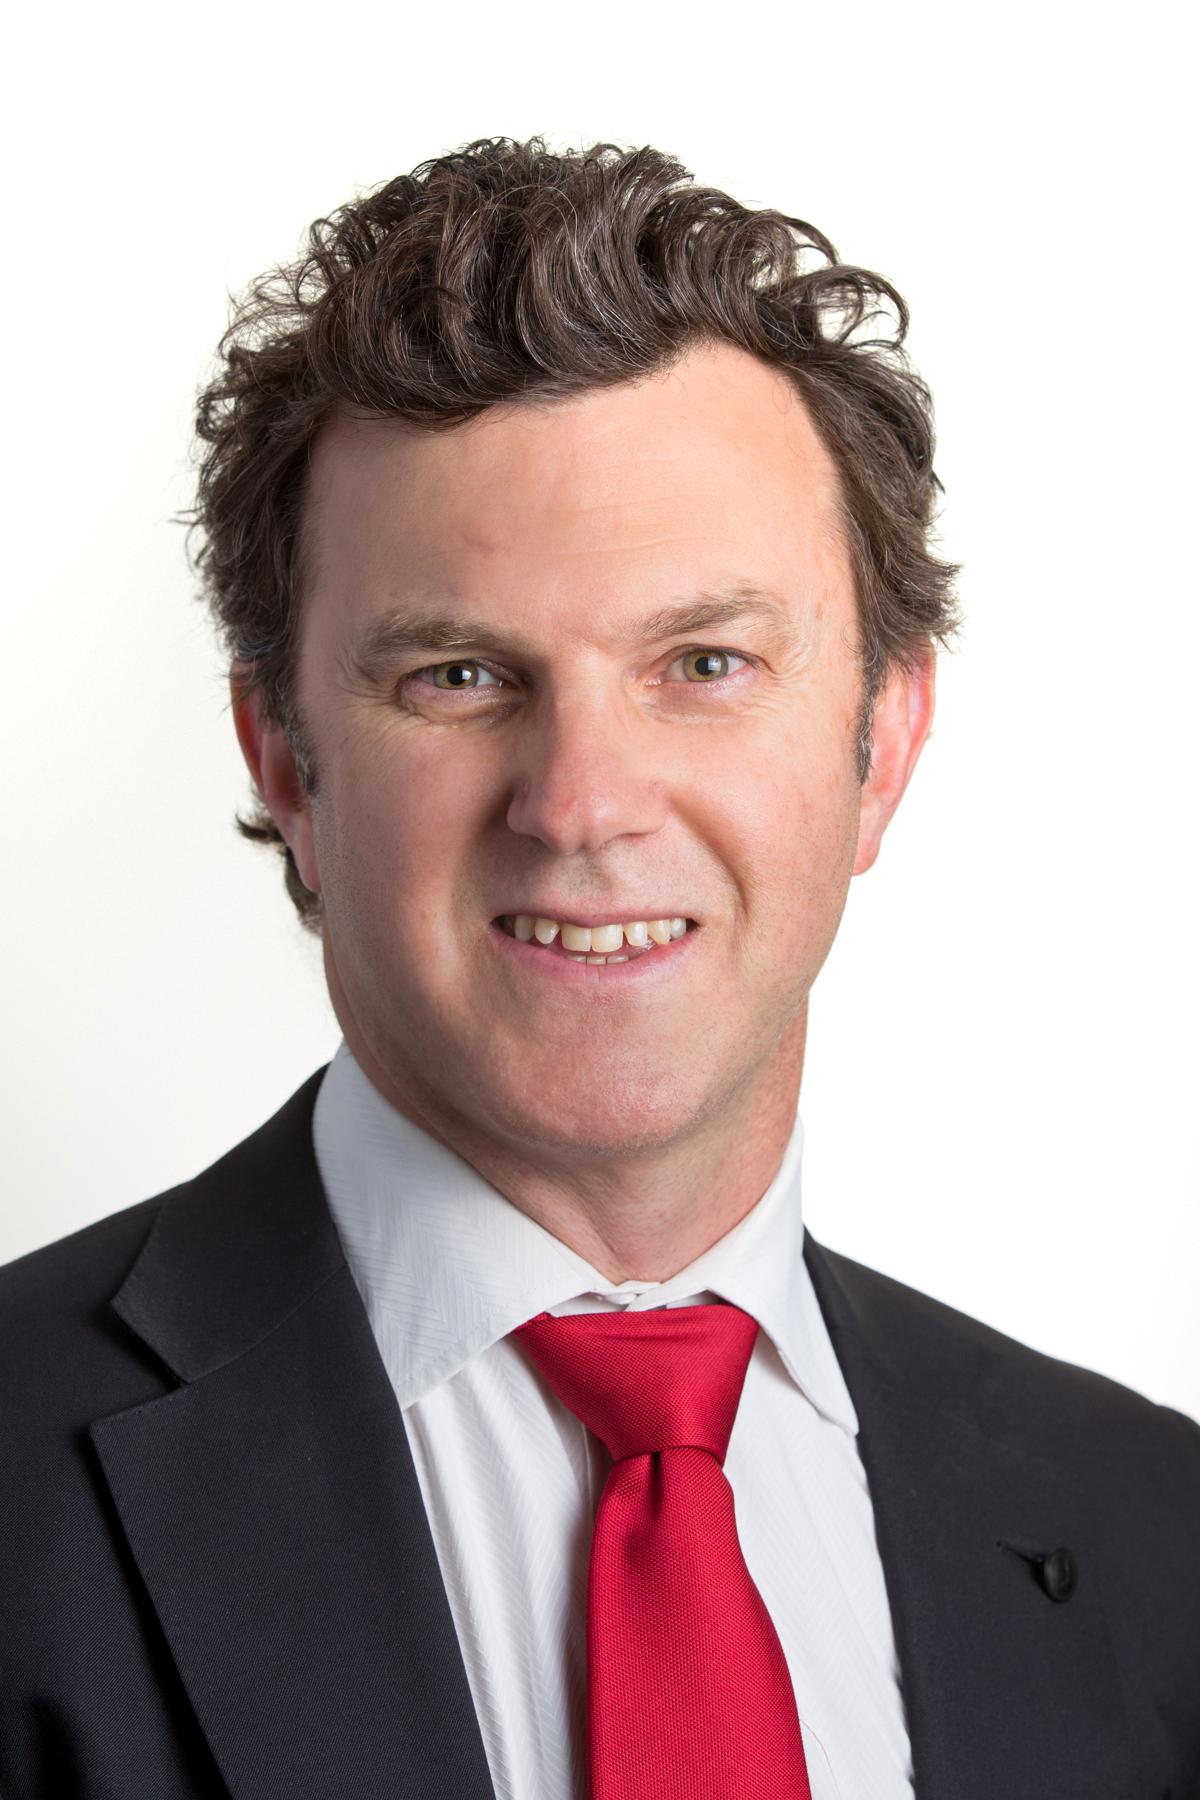 Mr Alan Carstens